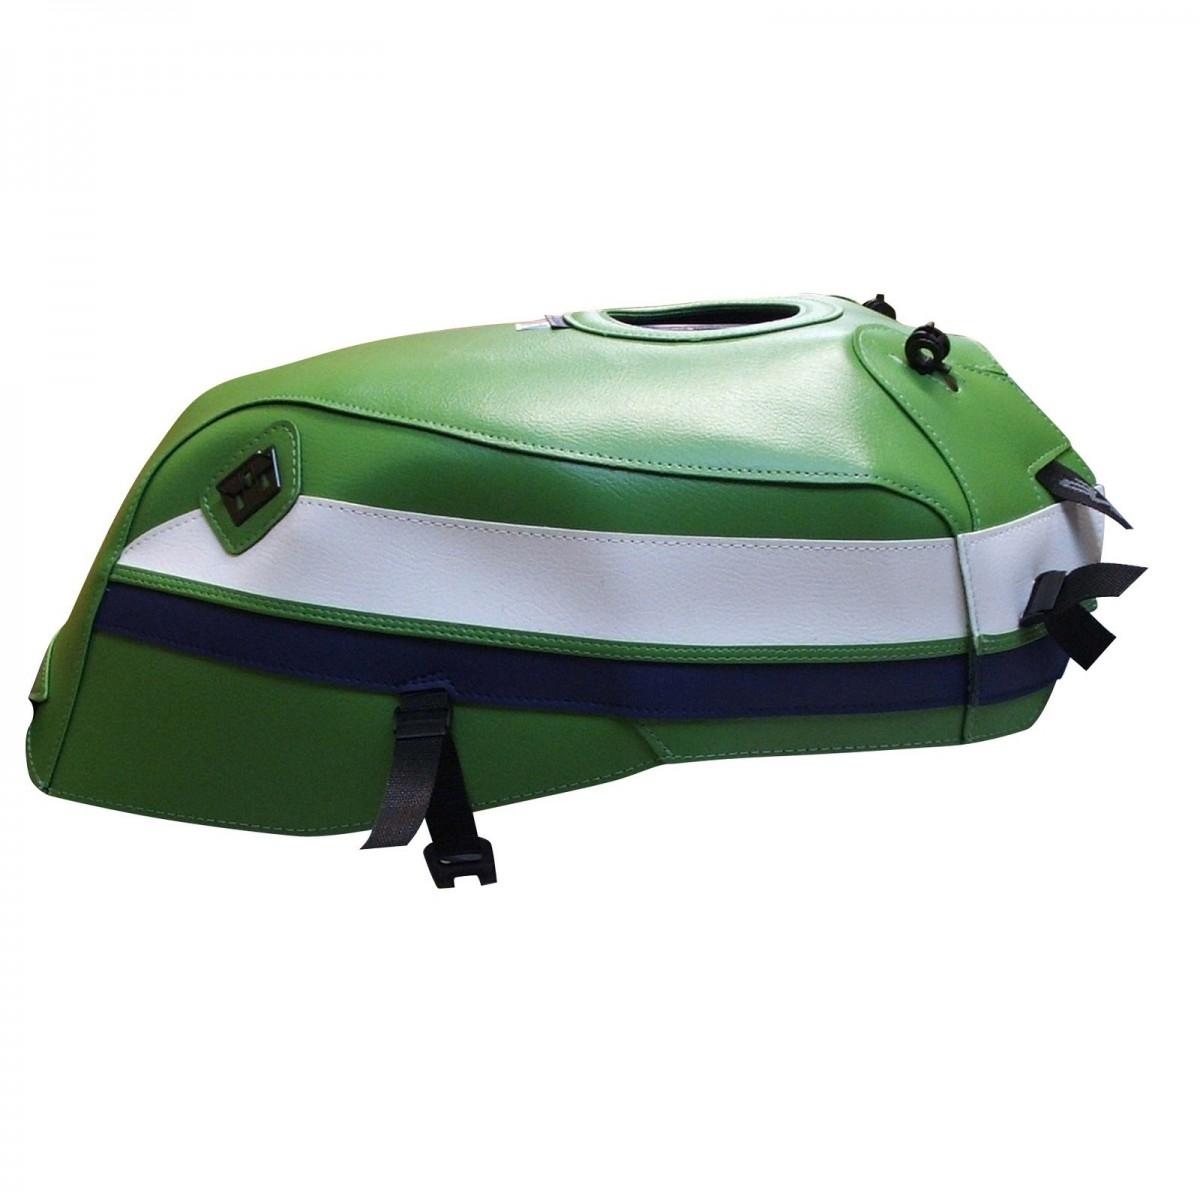 Protège-réservoir Bagster Kawasaki ZRX 1100 / ZRX 1200 N / ZRX 1200R /